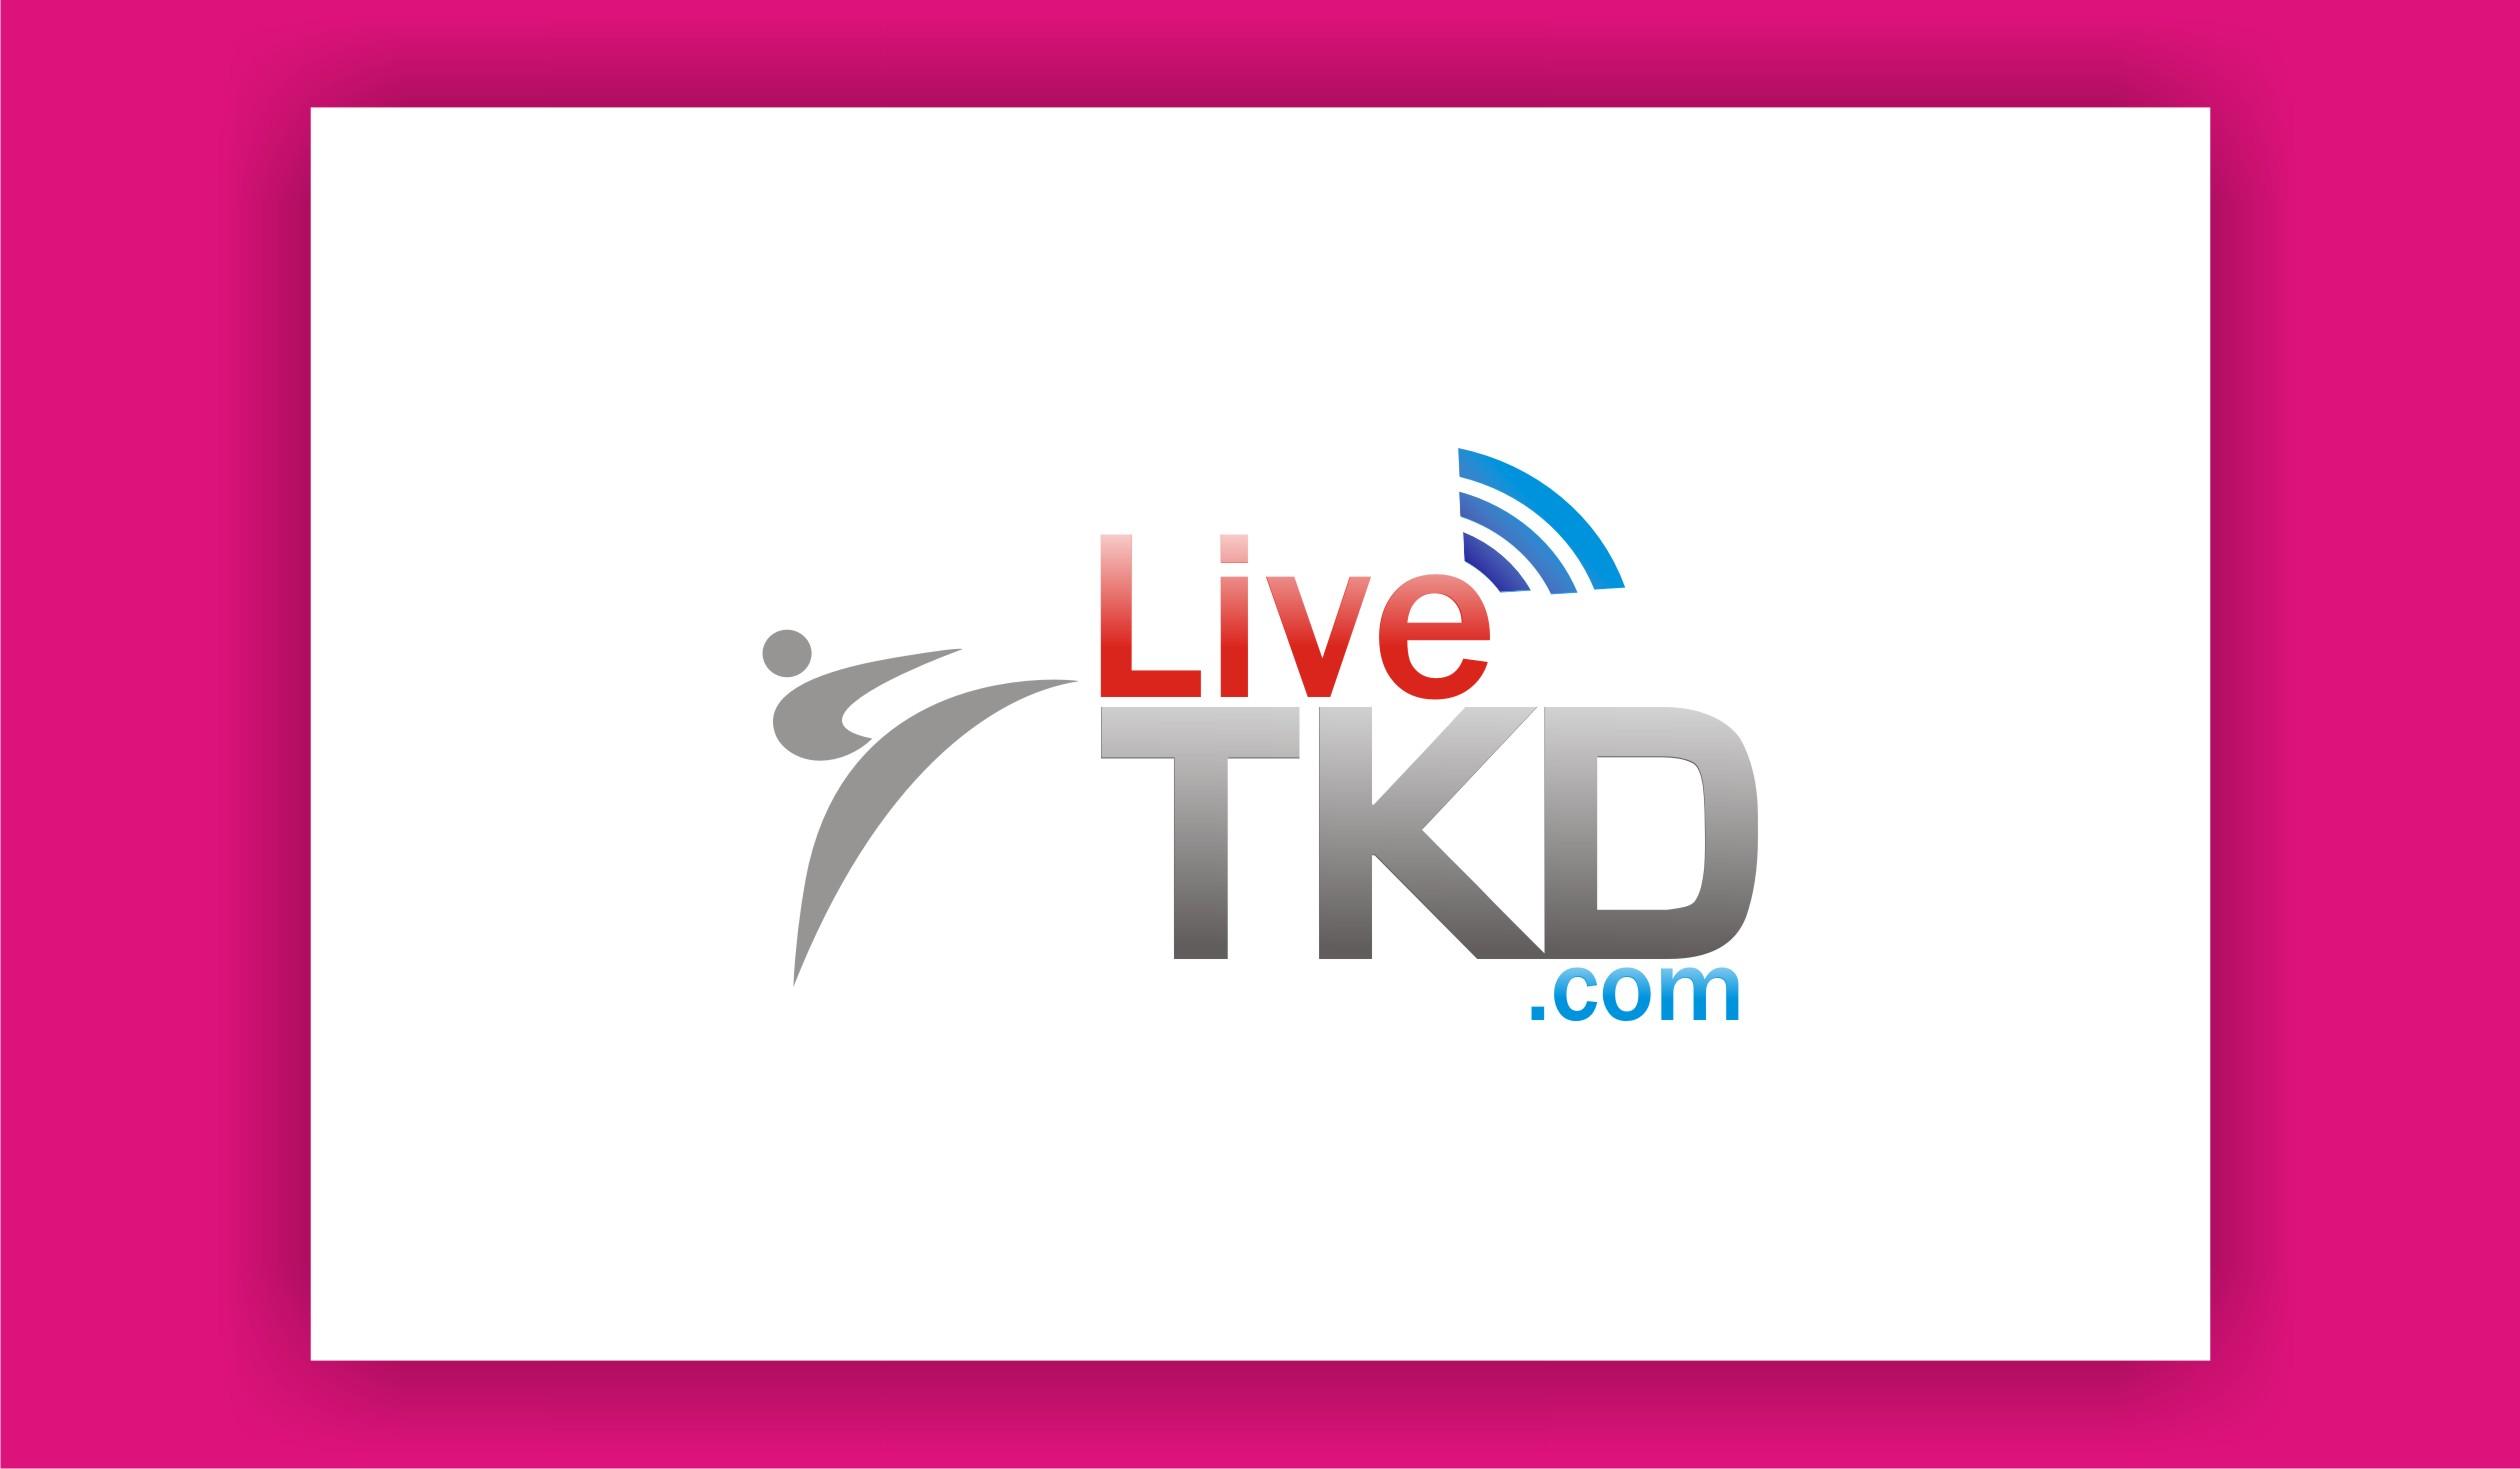 Logo Design by Shailender Kumar - Entry No. 148 in the Logo Design Contest New Logo Design for LiveTKD.com.